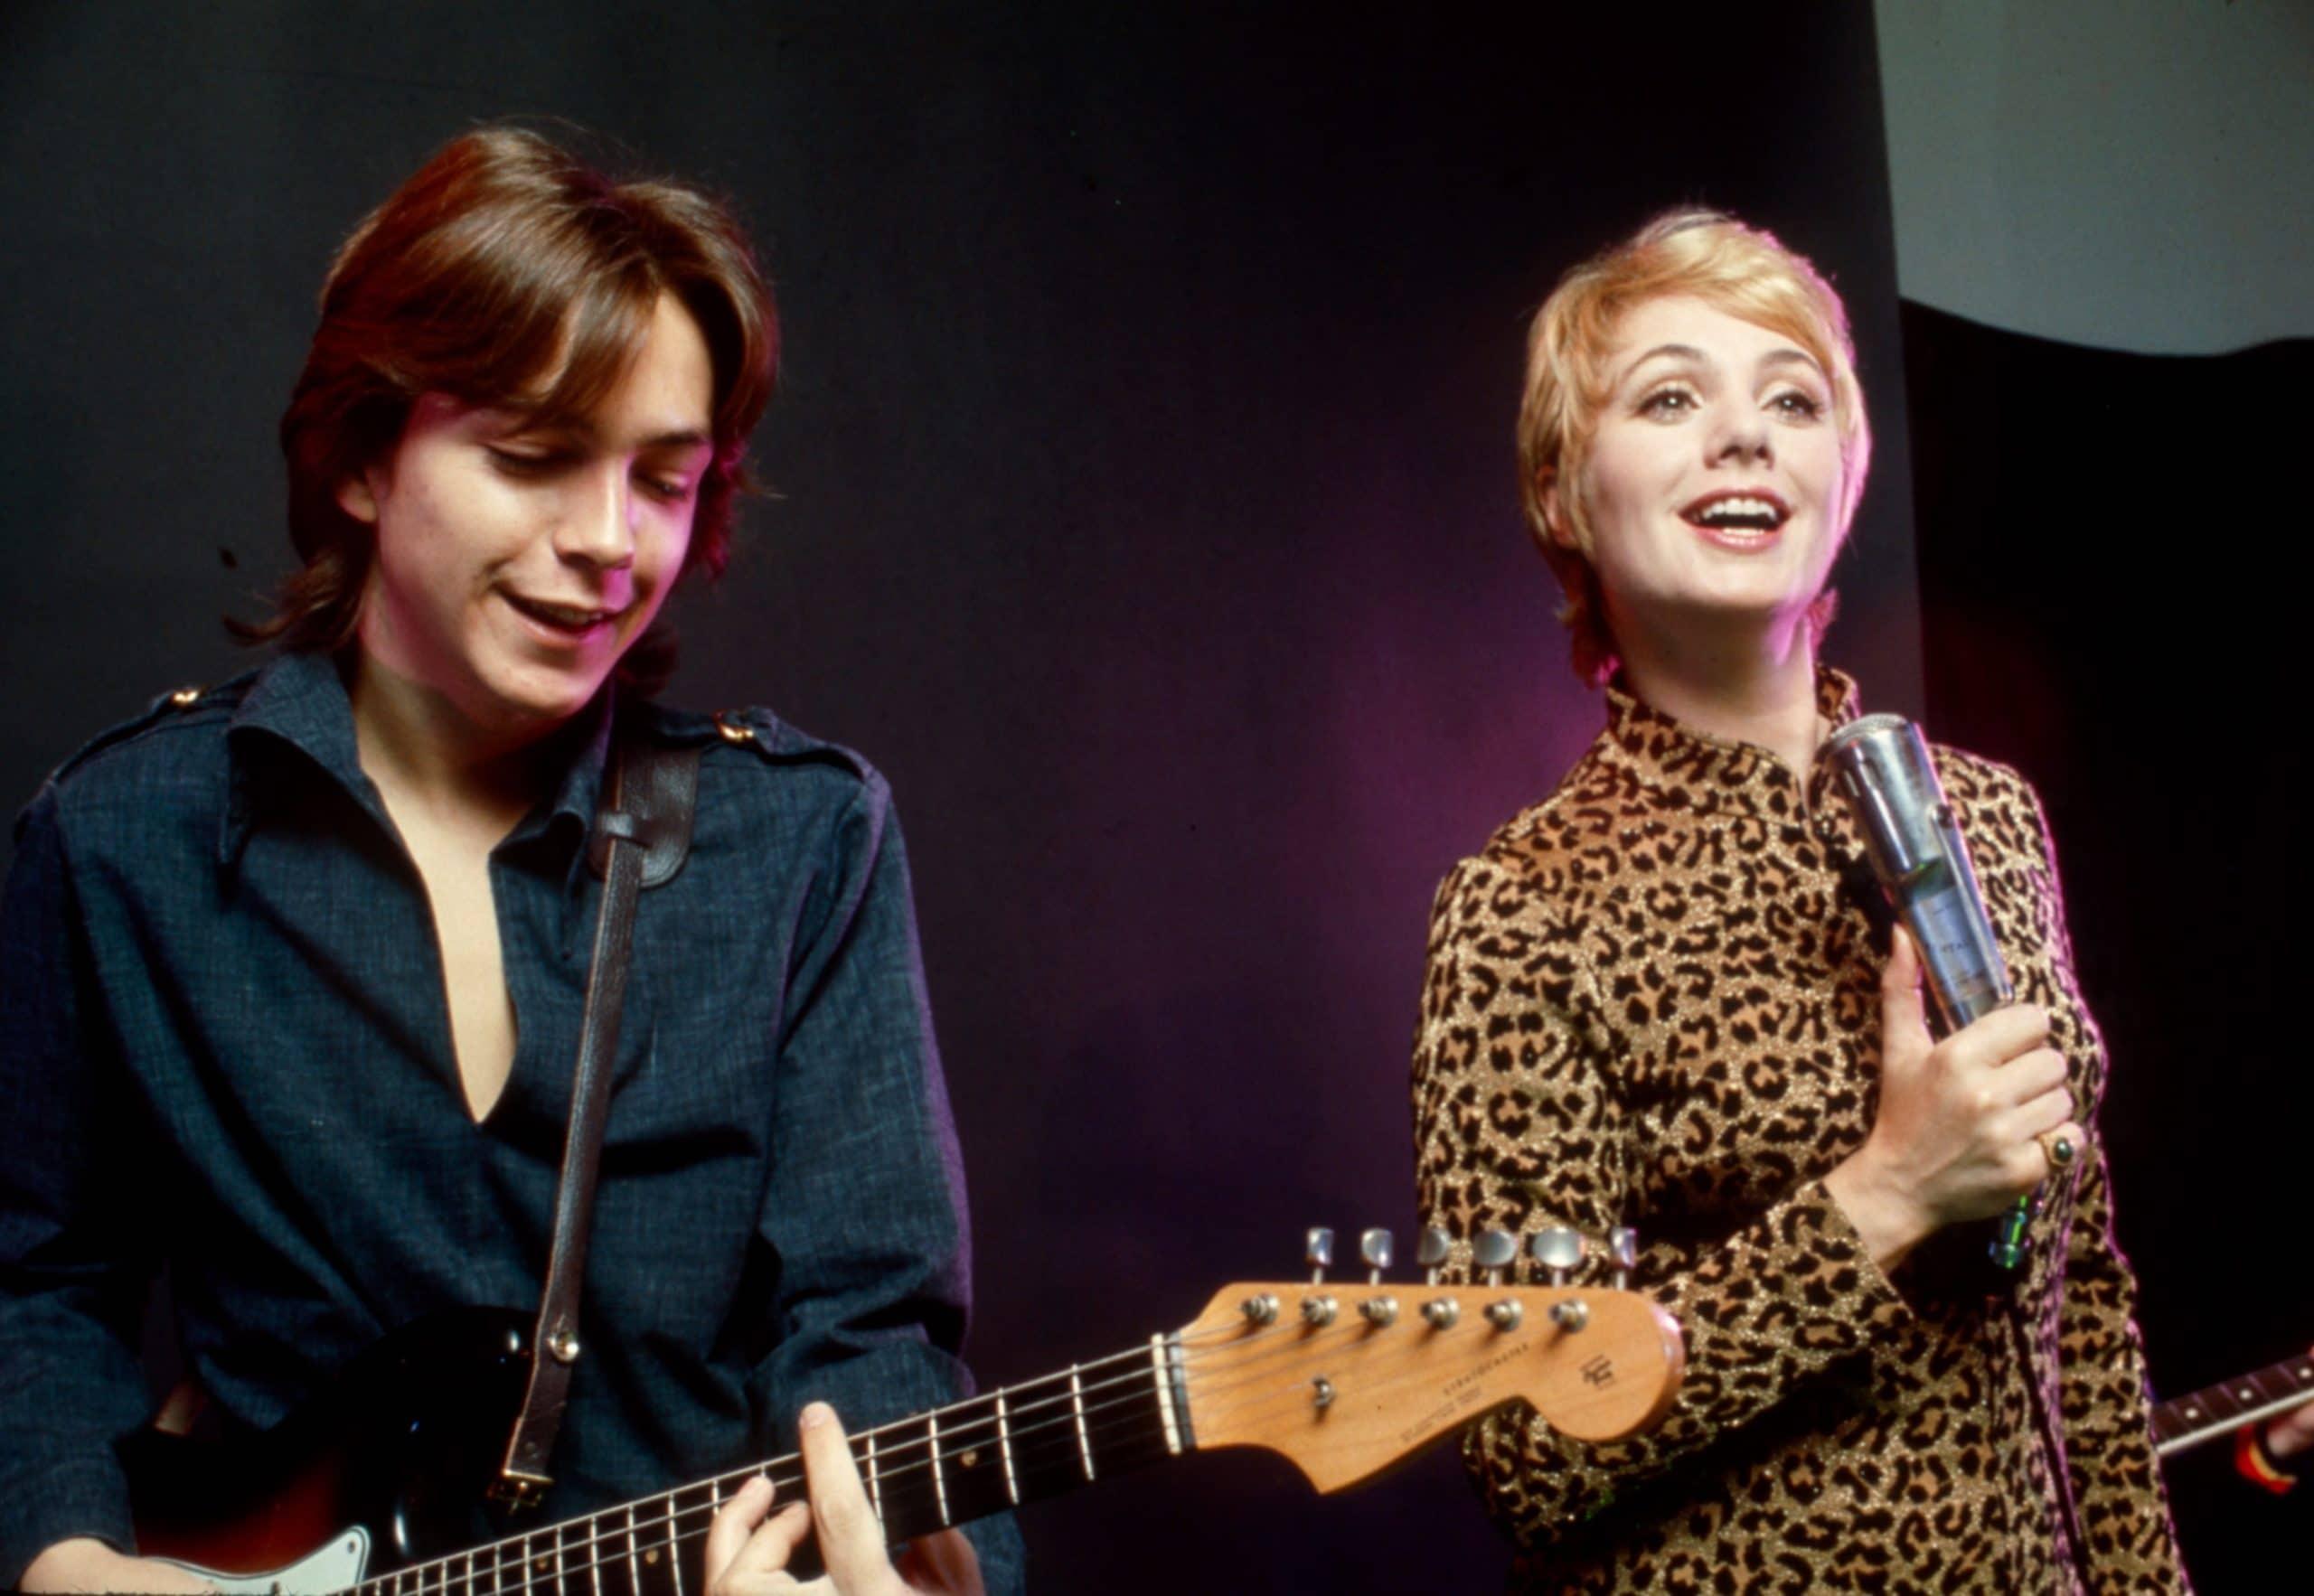 shirley jones and david cassidy performing